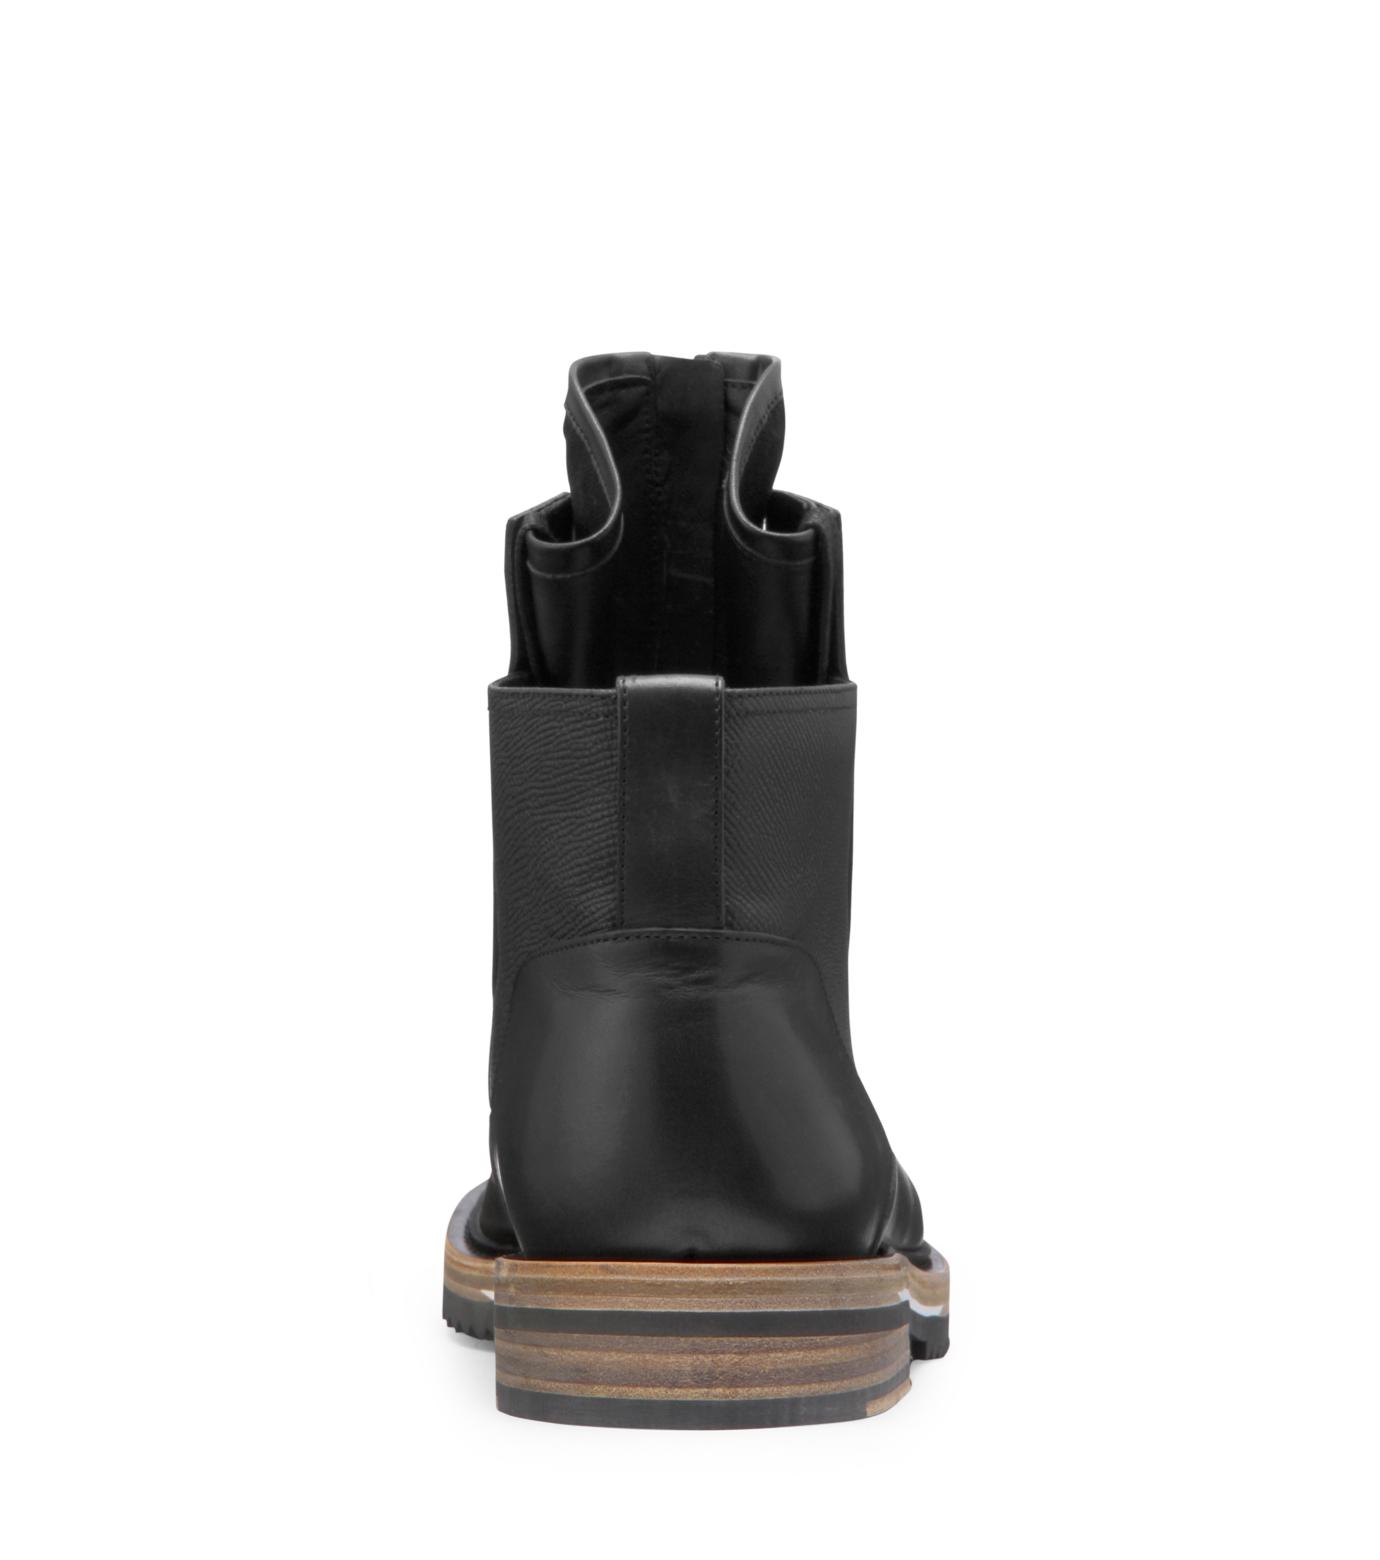 Dior Homme(ディオール オム)のCollection boots-BLACK-3BO080VDZ-13 拡大詳細画像3